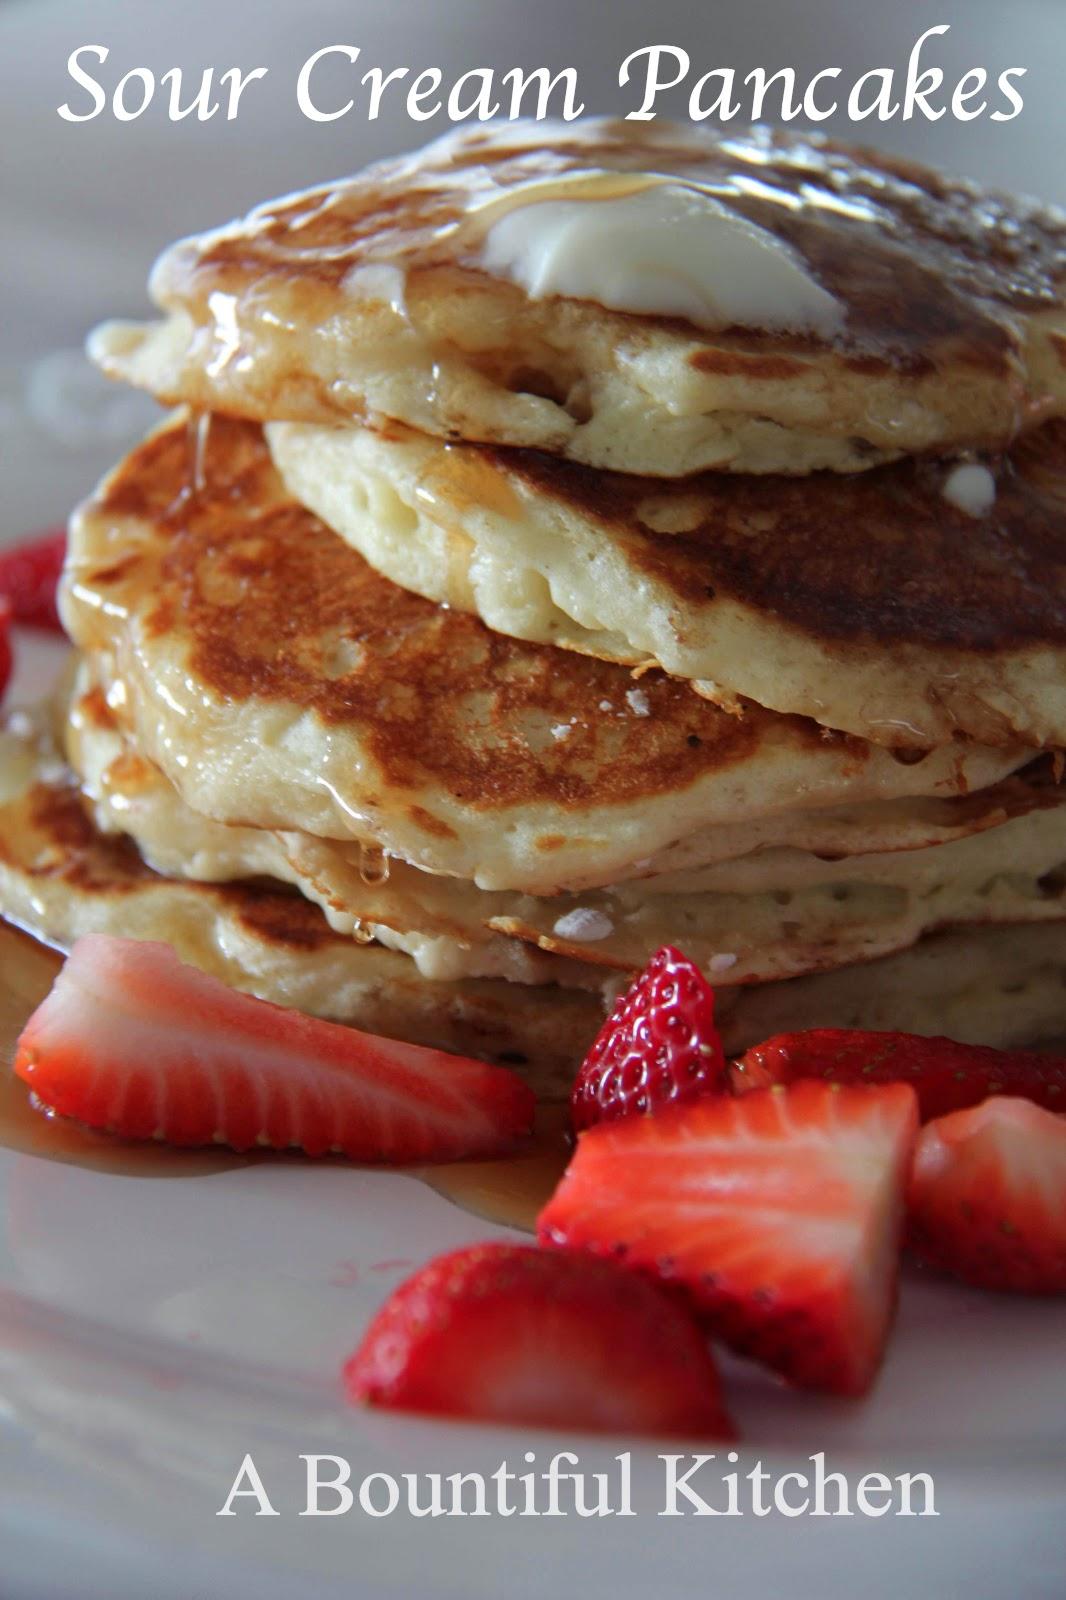 A Bountiful Kitchen Sour Cream Pancakes